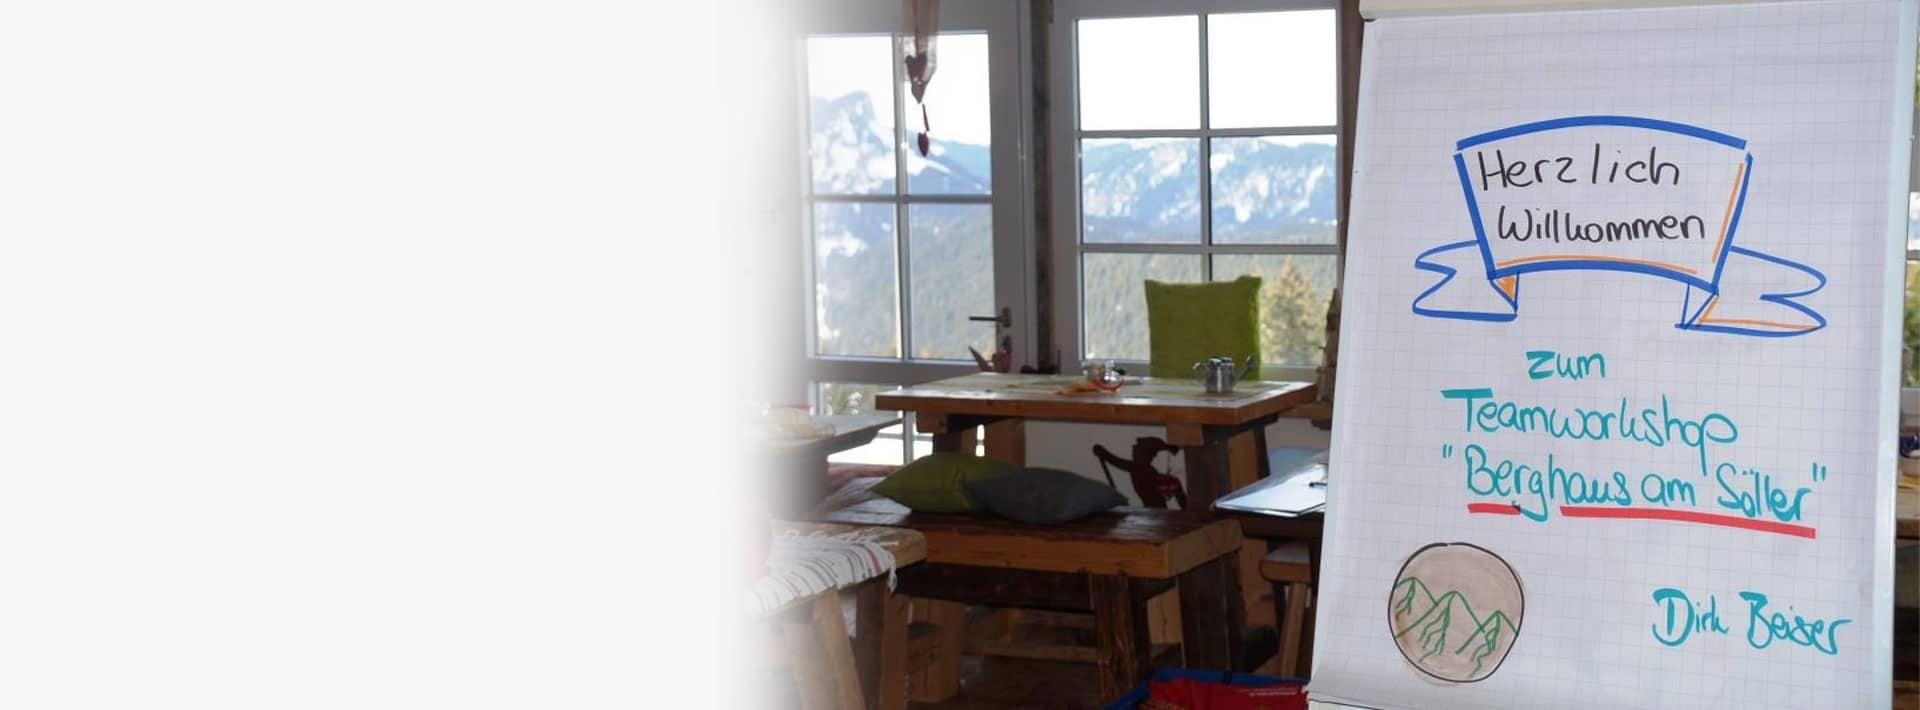 Teamworkshop im Berghaus Blogbeitrag